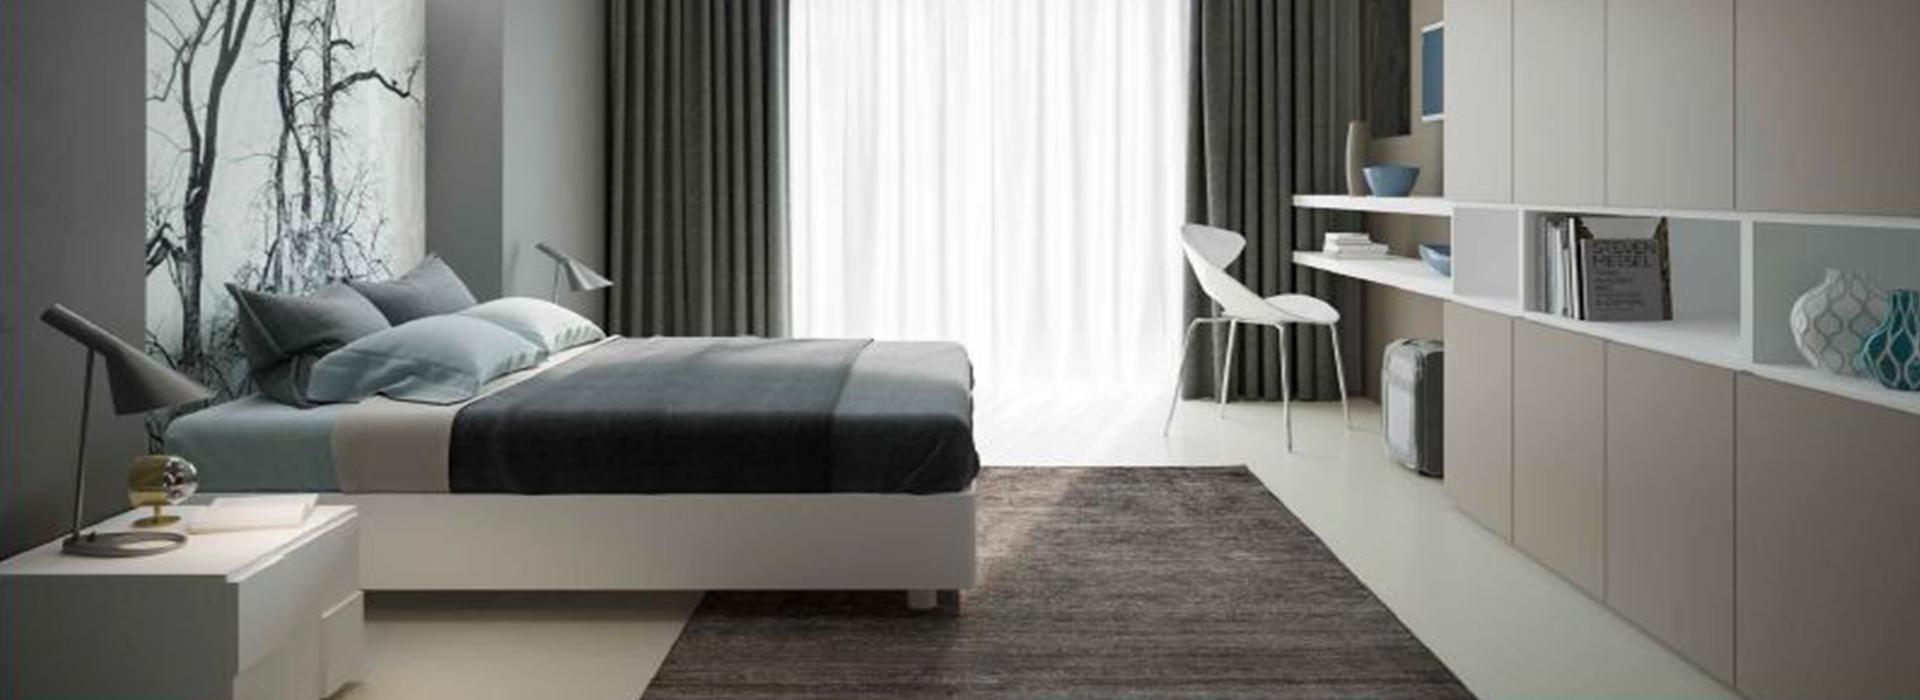 Arredamento moderno contemporaneo design casa creativa e - Mobili stile moderno contemporaneo ...